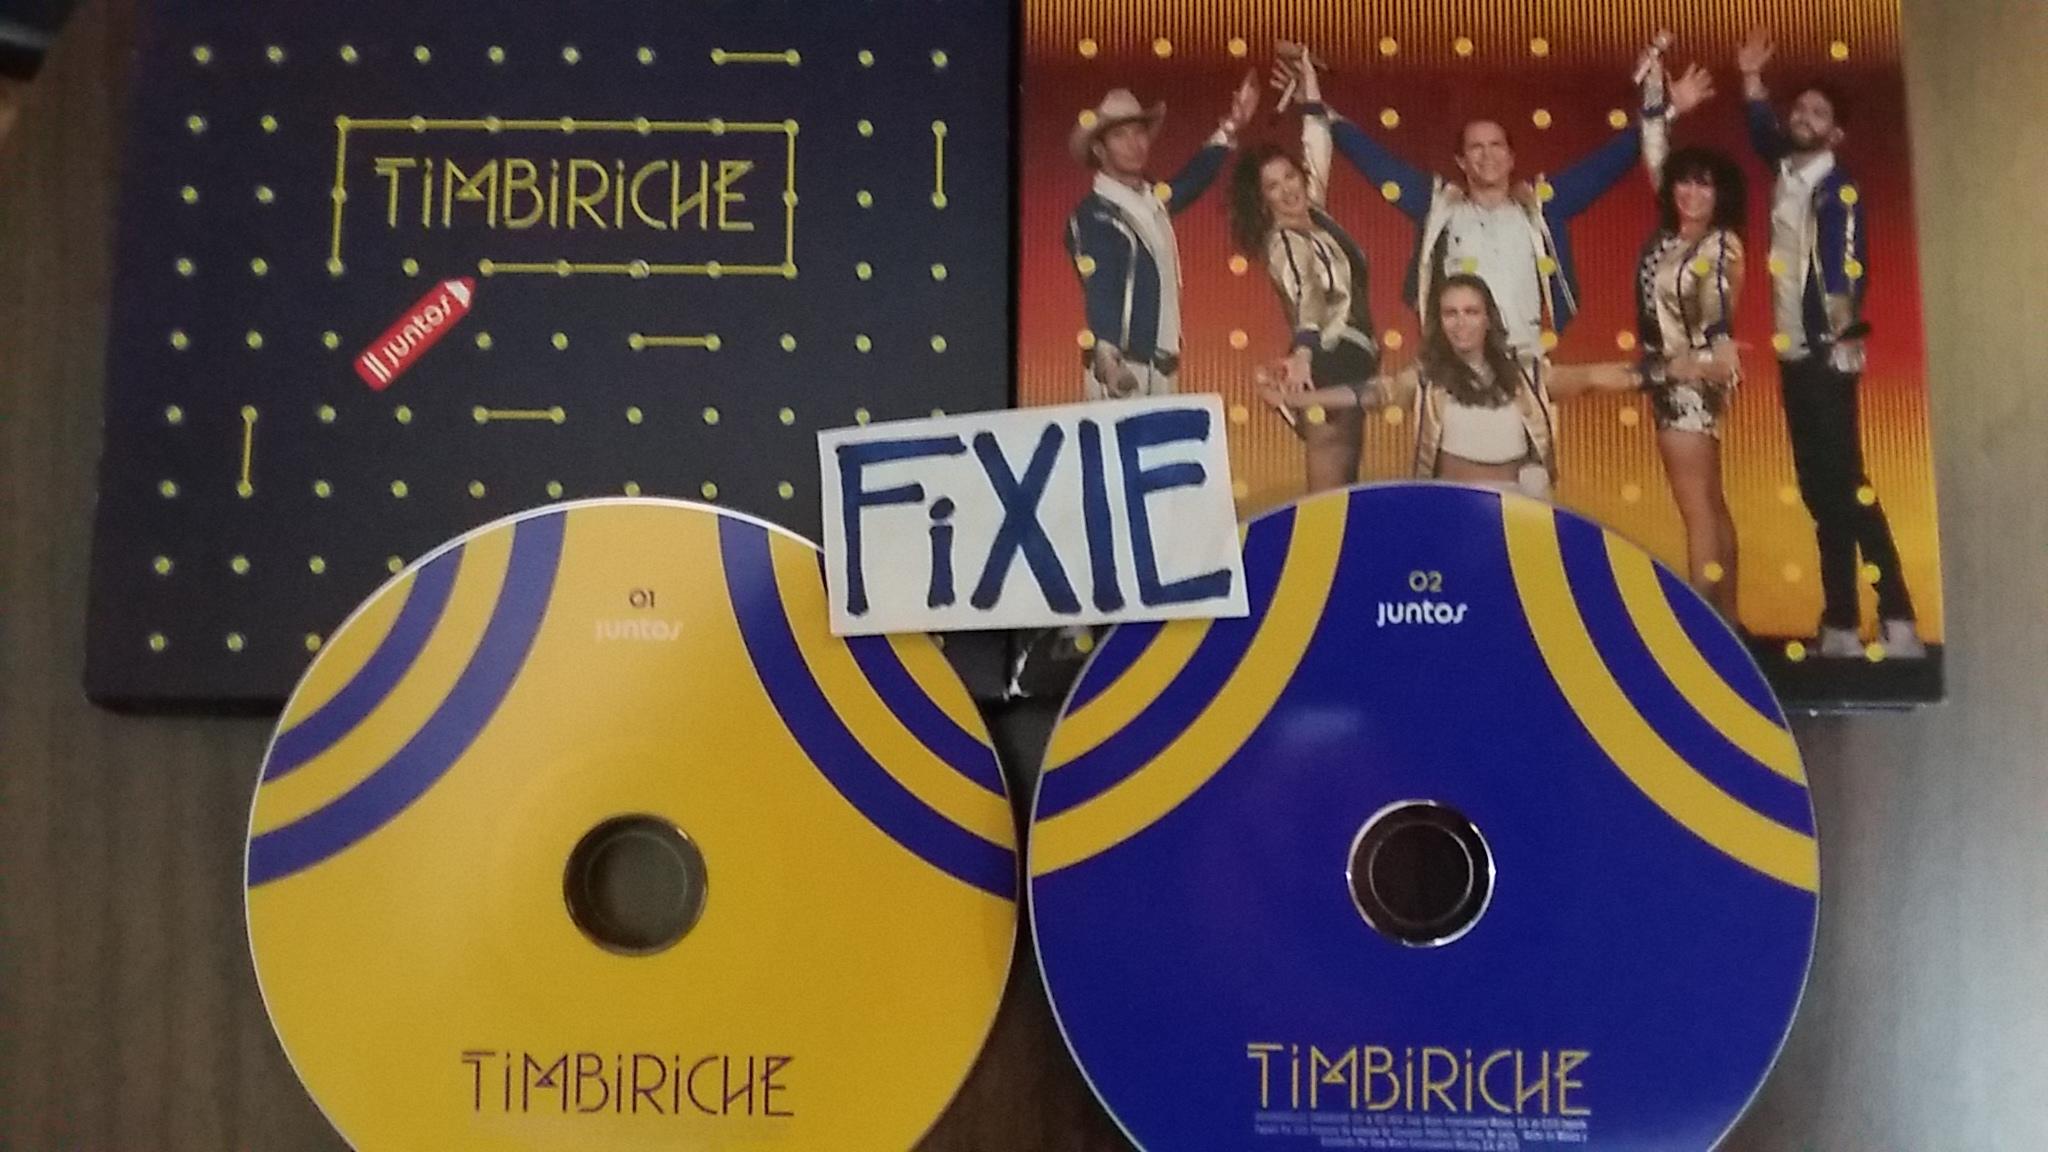 Timbiriche-Juntos-ES-2CD-FLAC-2017-FiXIE